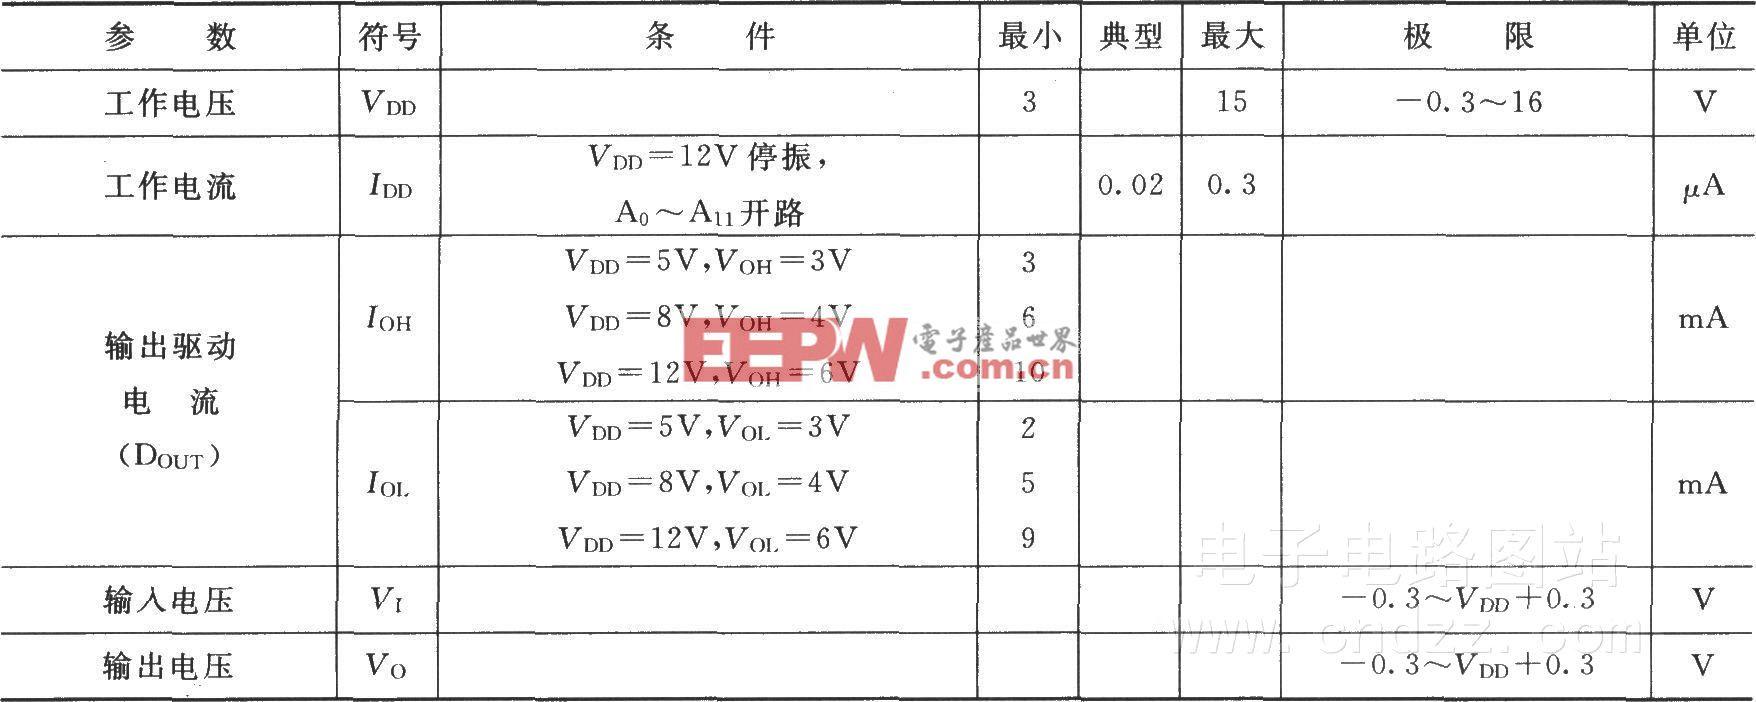 PT2262-IR的参数表